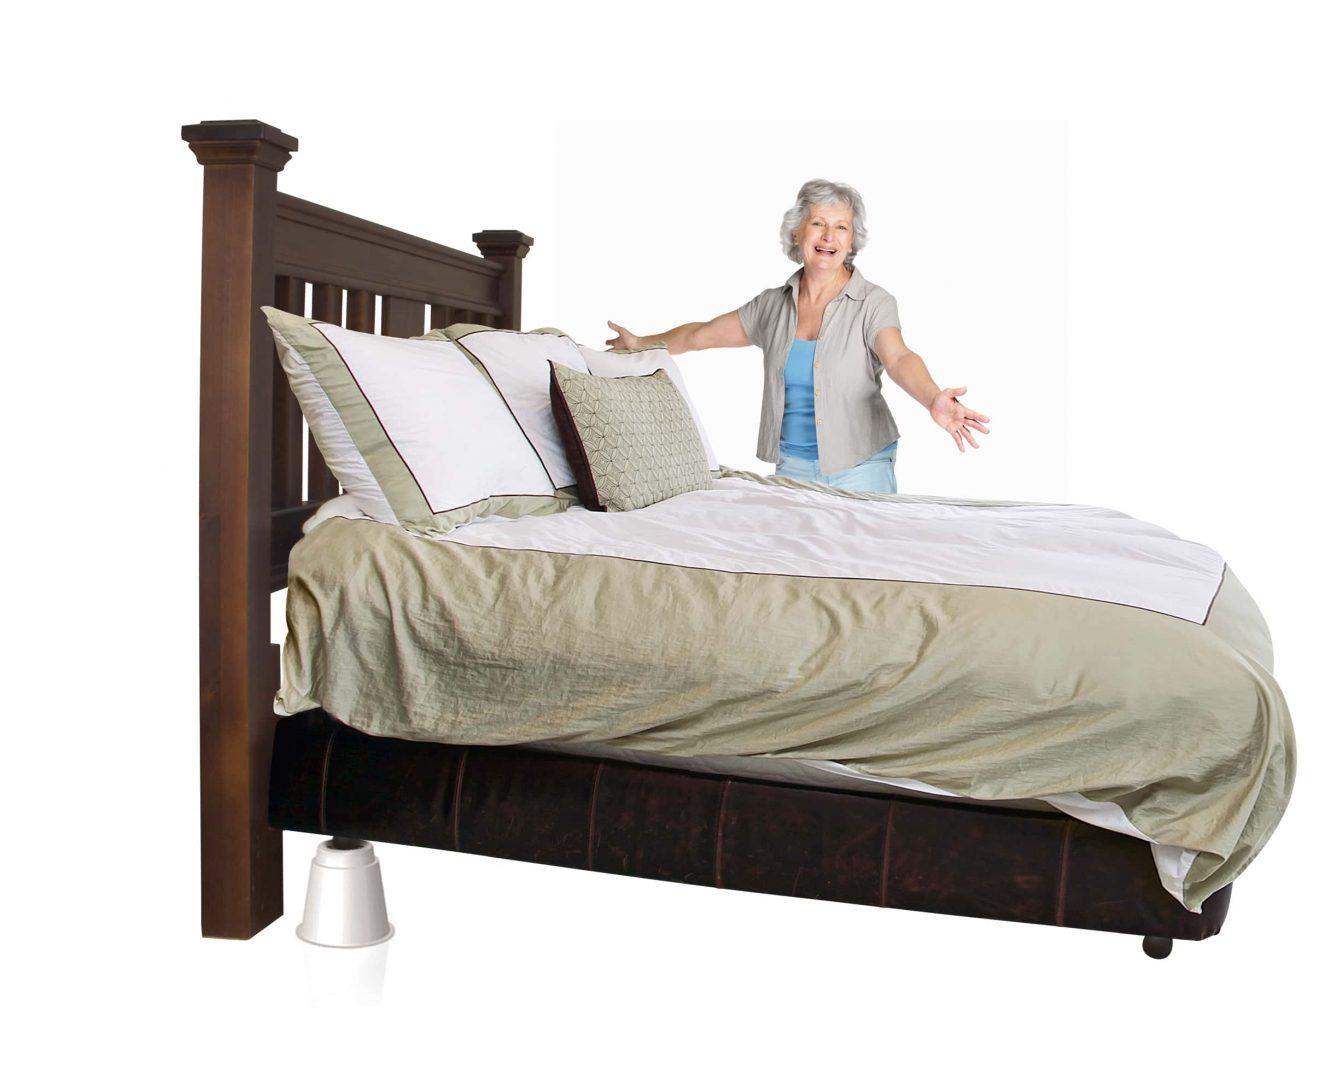 CB656 Medical Bed Risers | Riser | Raisers | Slipstick Foot